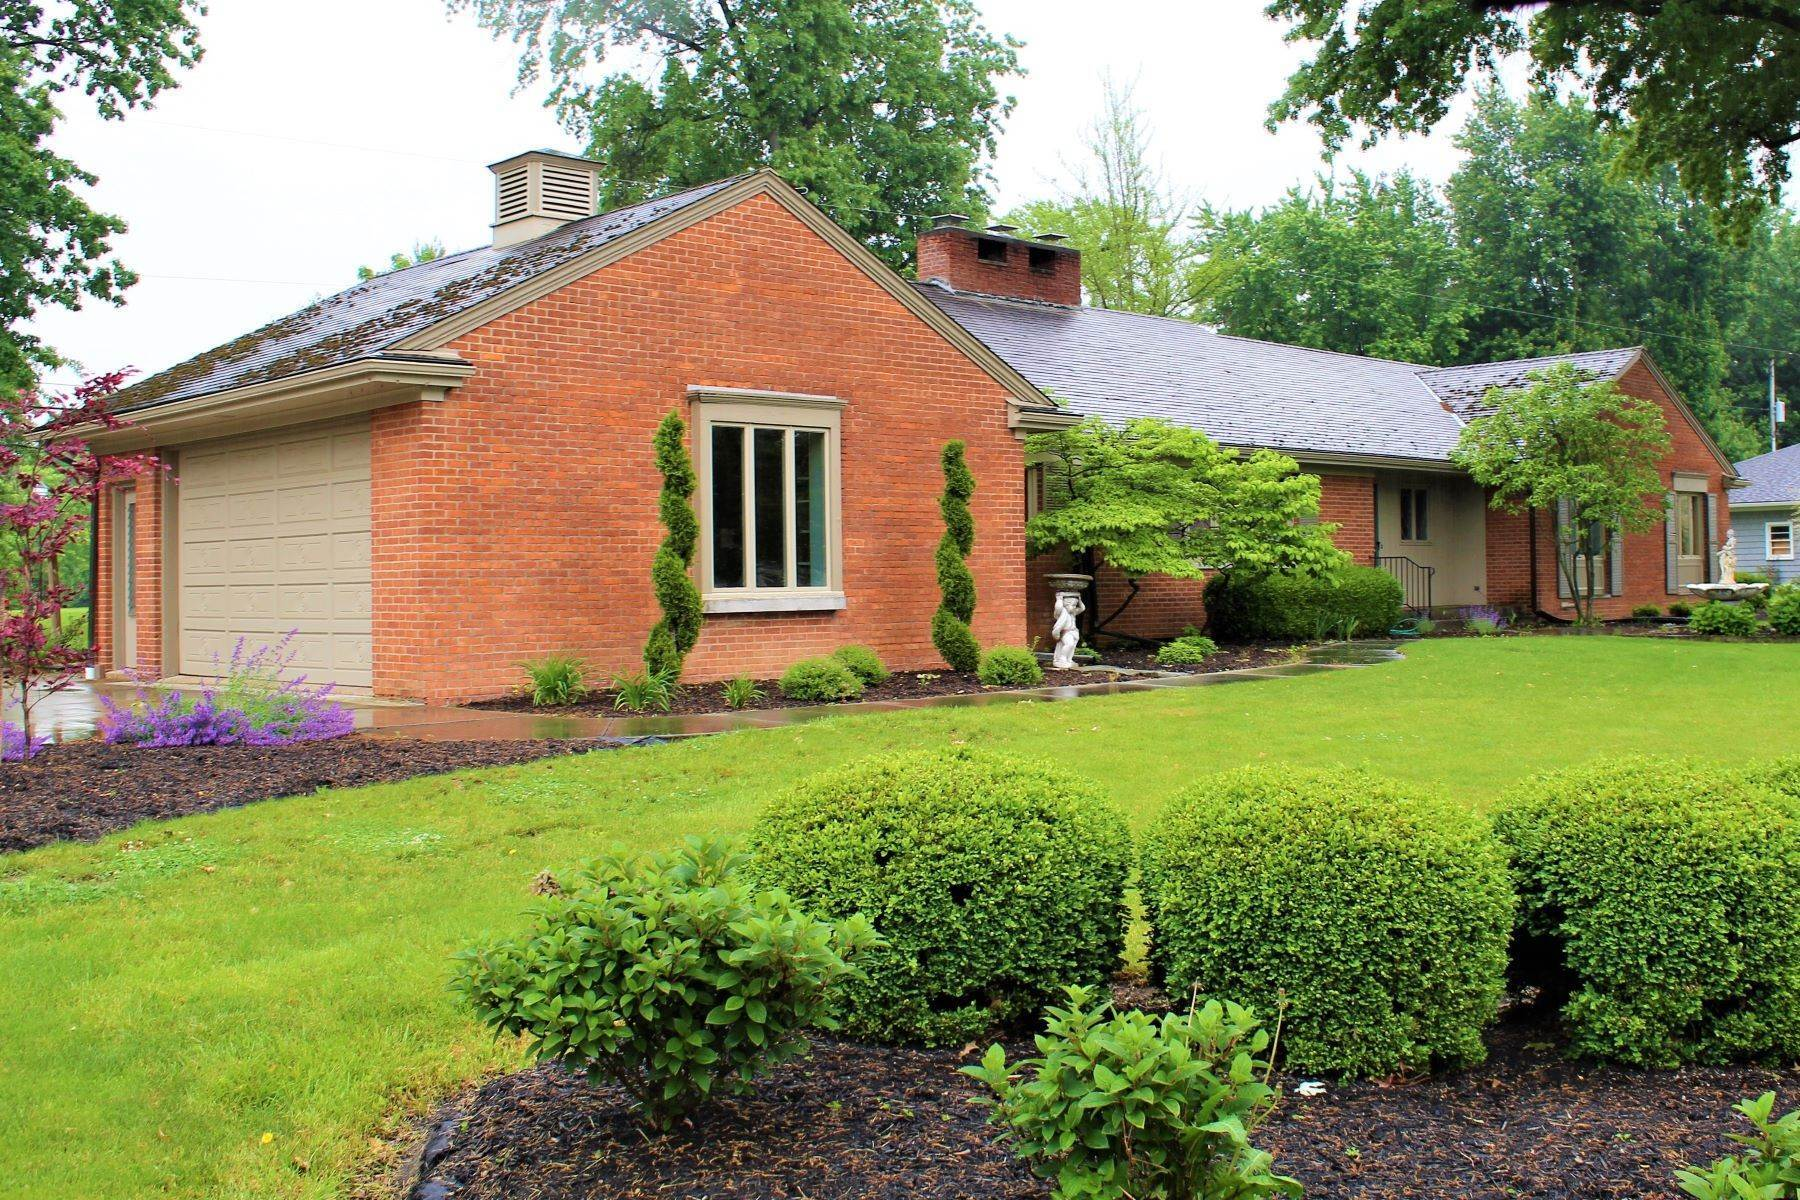 Single Family Homes for Sale at 1028 Lavina Avenue Bucyrus, Ohio 44820 United States